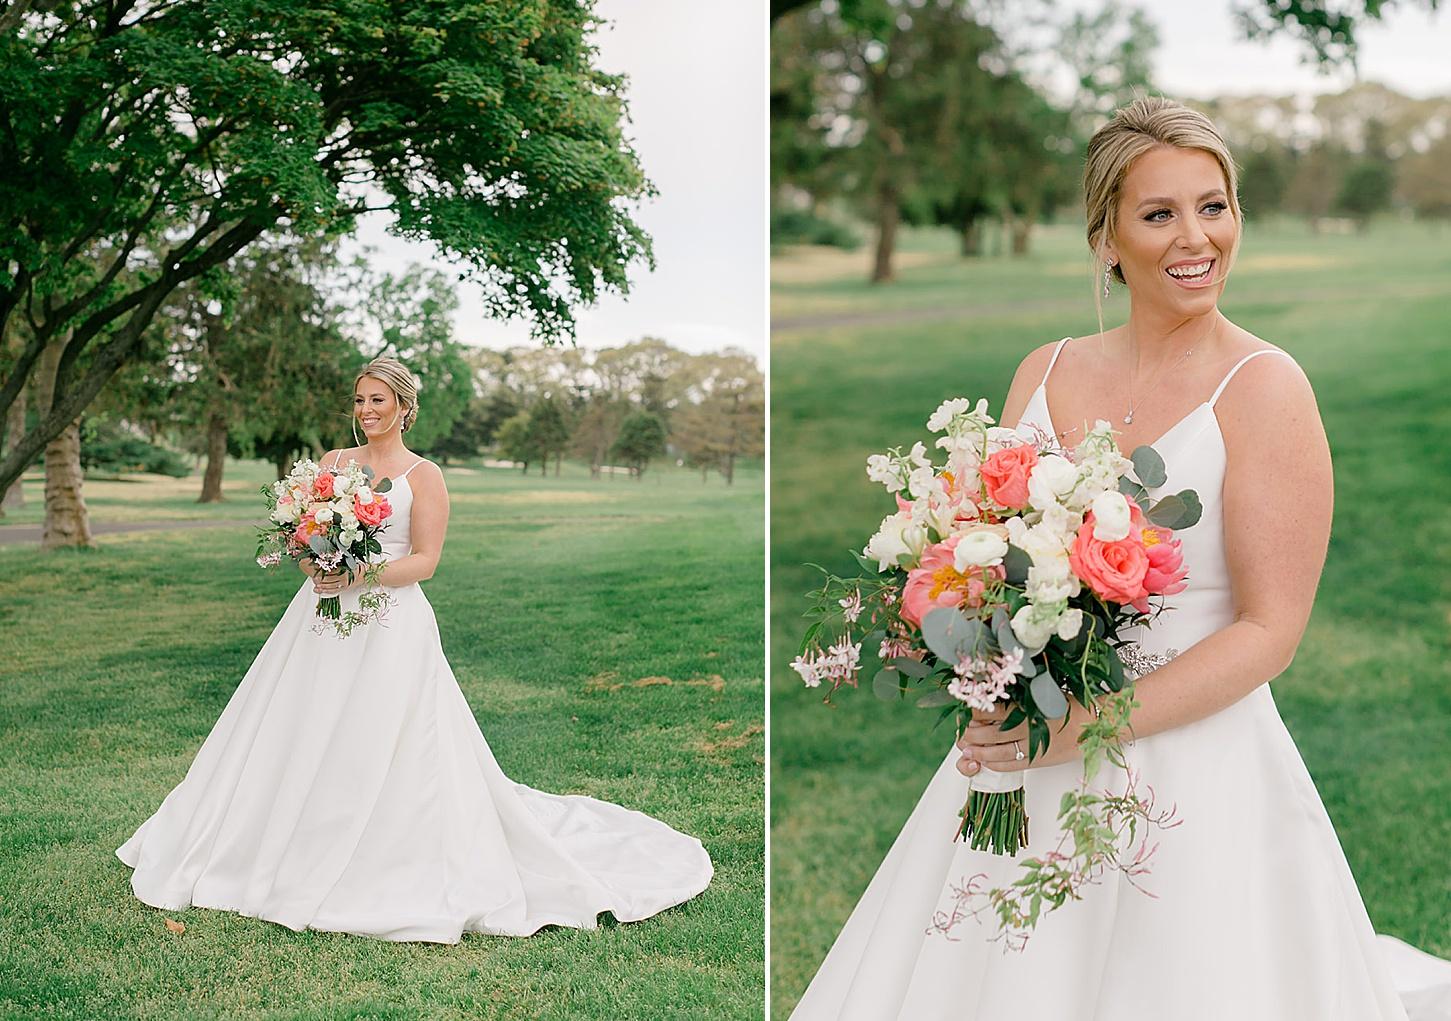 Linwood Country Club Summer Wedding Photography Studio by Magdalena Studios Jenn Kyle 0034